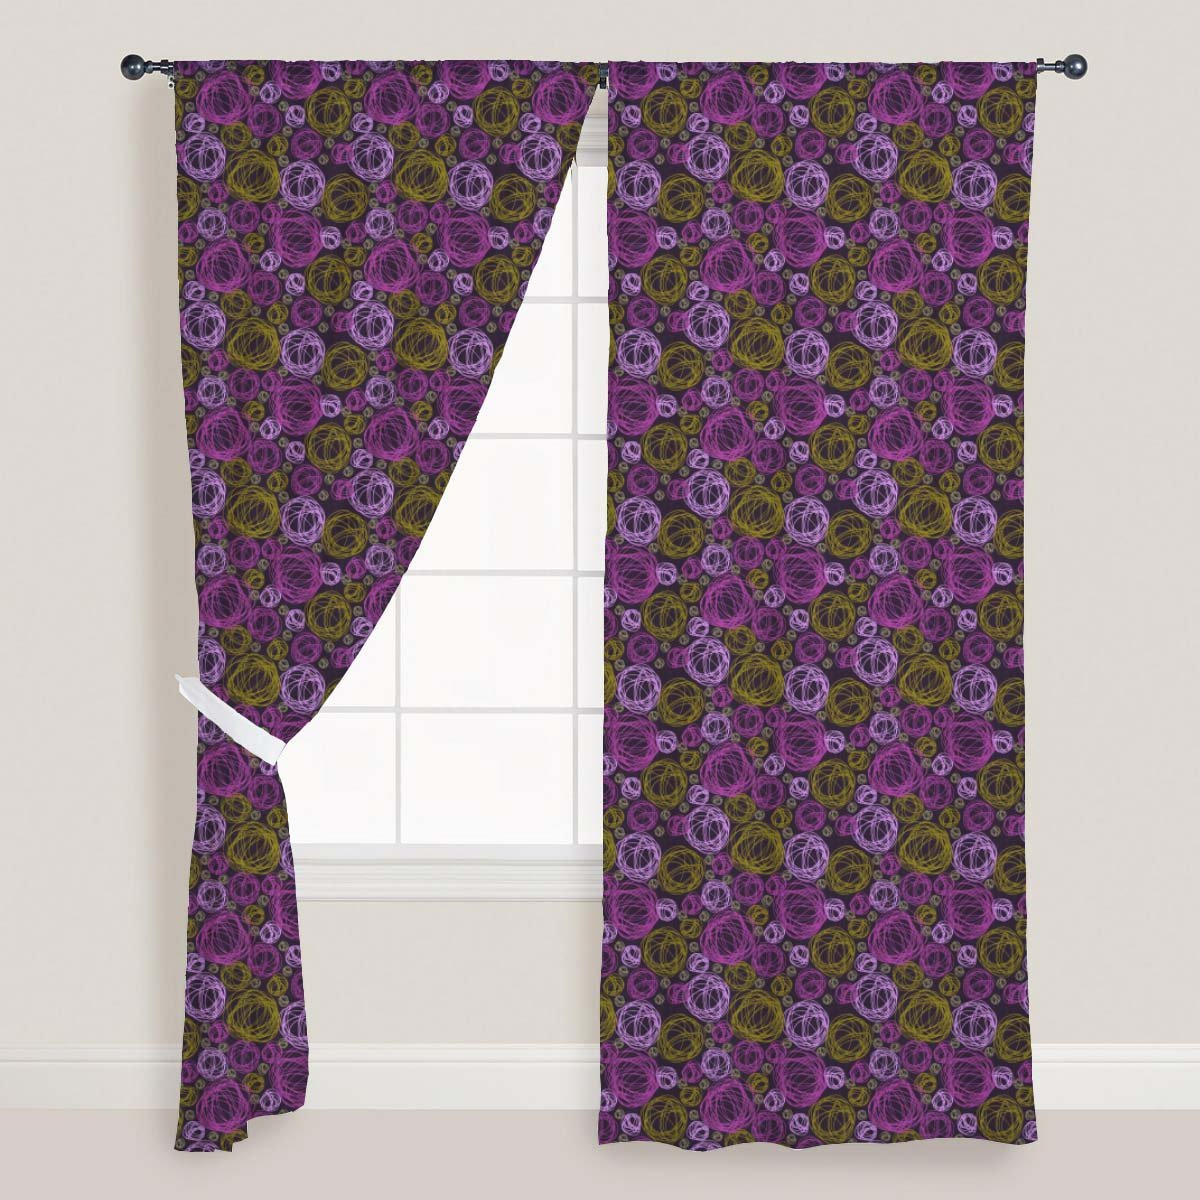 AZ Swirl Door & Window Curtain Satin 4feet x 11feet; SET OF 2 PCS